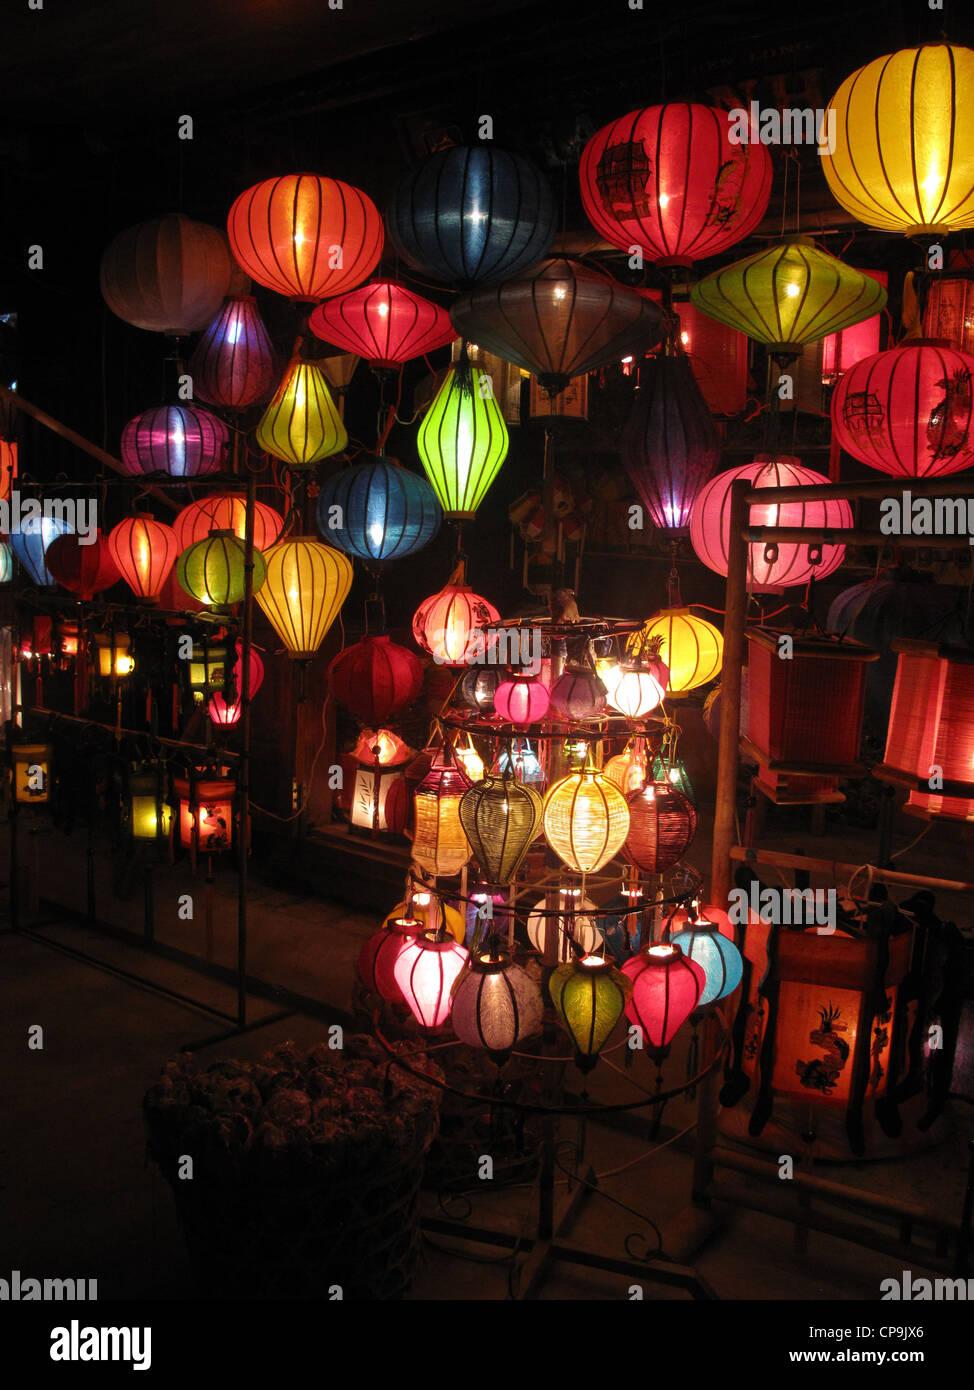 Lampions, Laternen, Hoi An, Vietnam, Asien - Stock Image